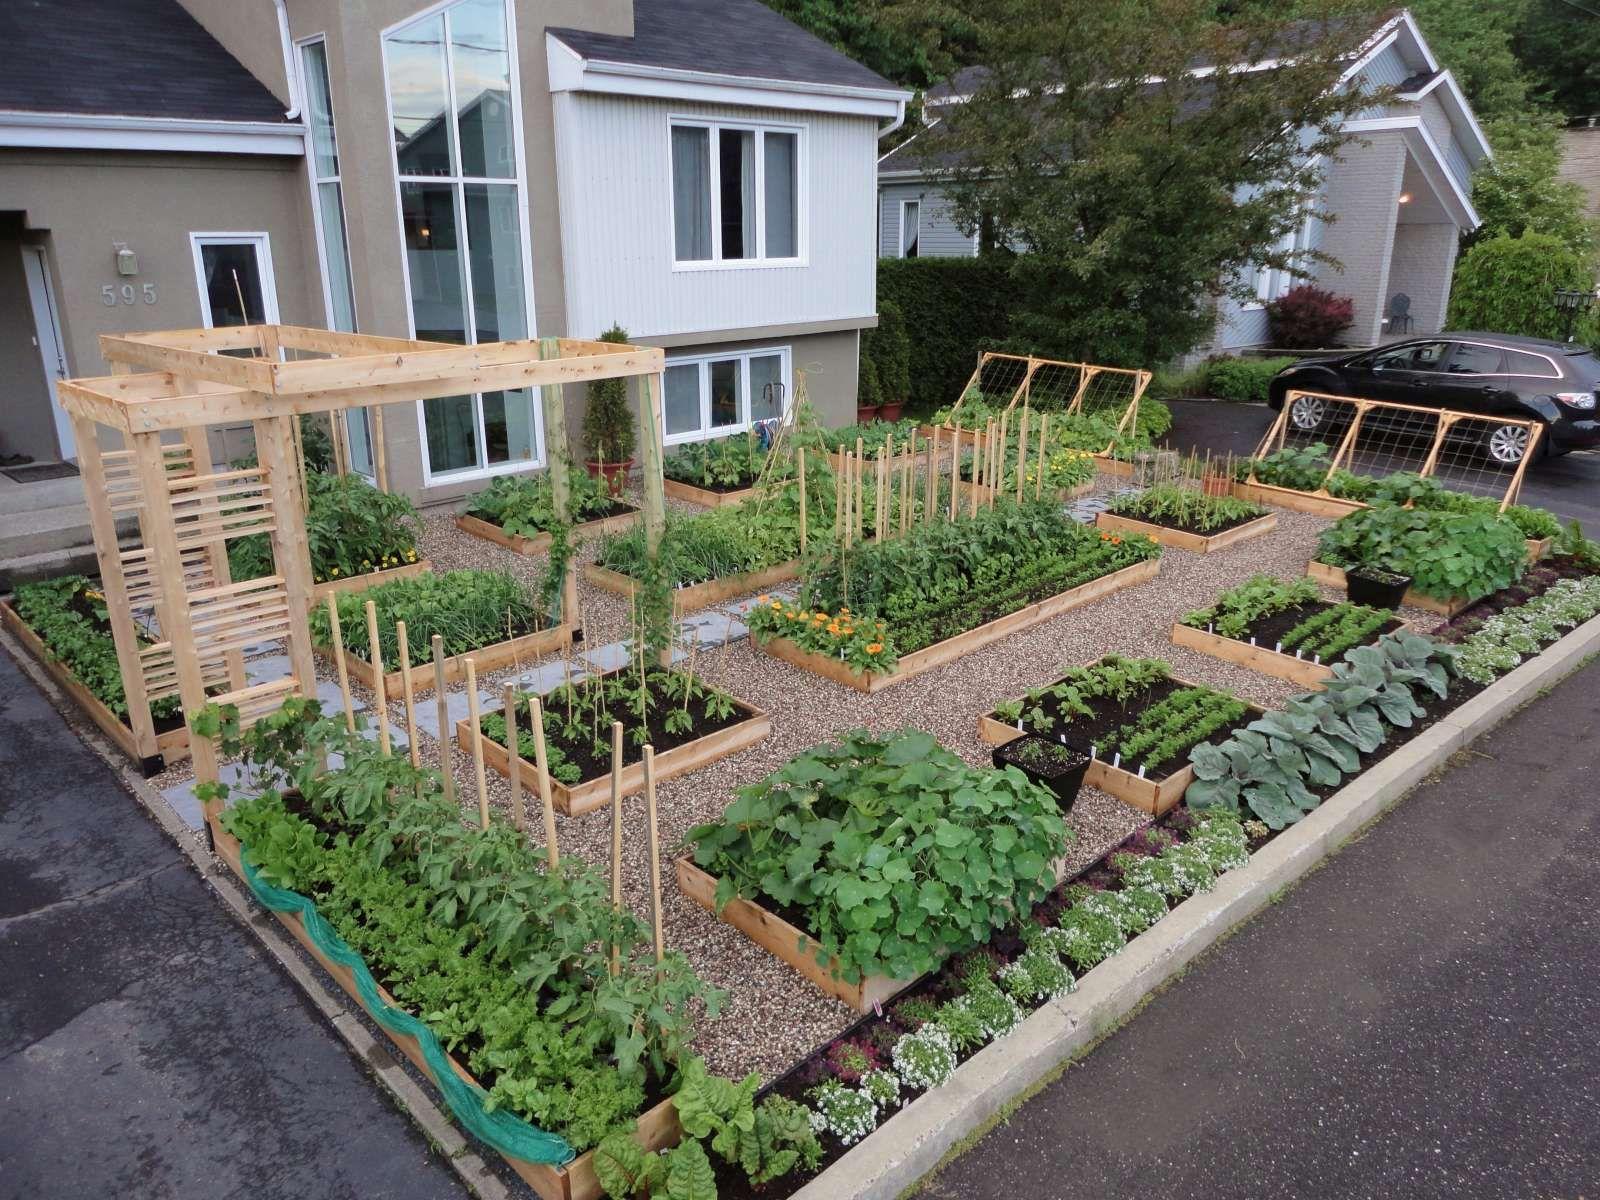 17 Ide Kreatif Bikin Kebun Sayur Di Rumah Sendiri Garden Layout Garden Layout Vegetable Vegetable Garden Design Front yard garden box ideas